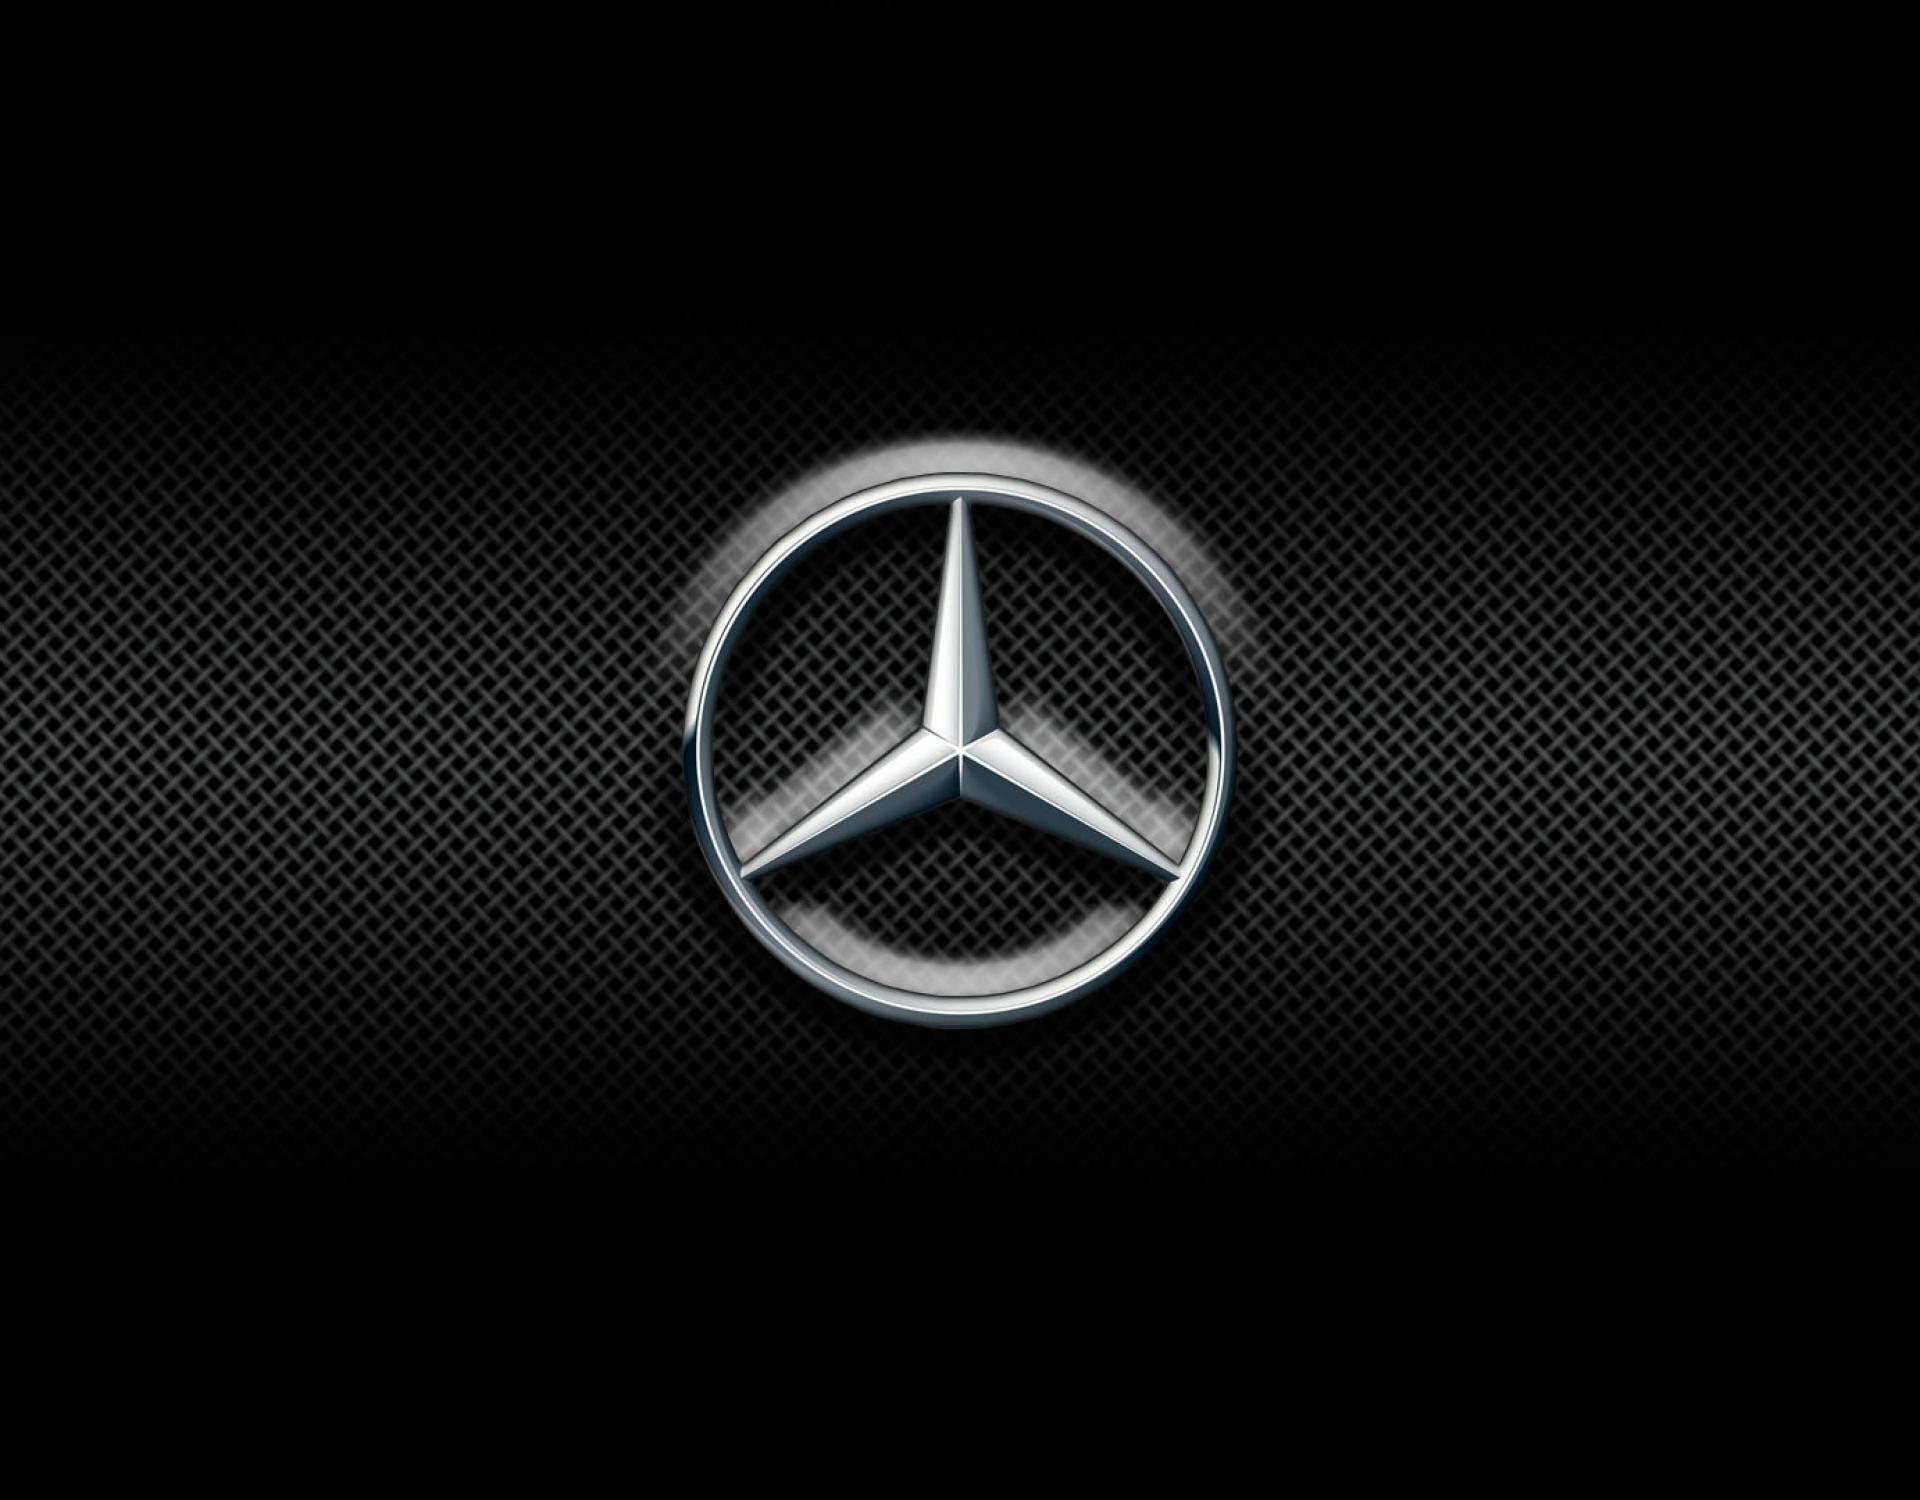 Mercedes Benz HD Wallpapers 1920x1500